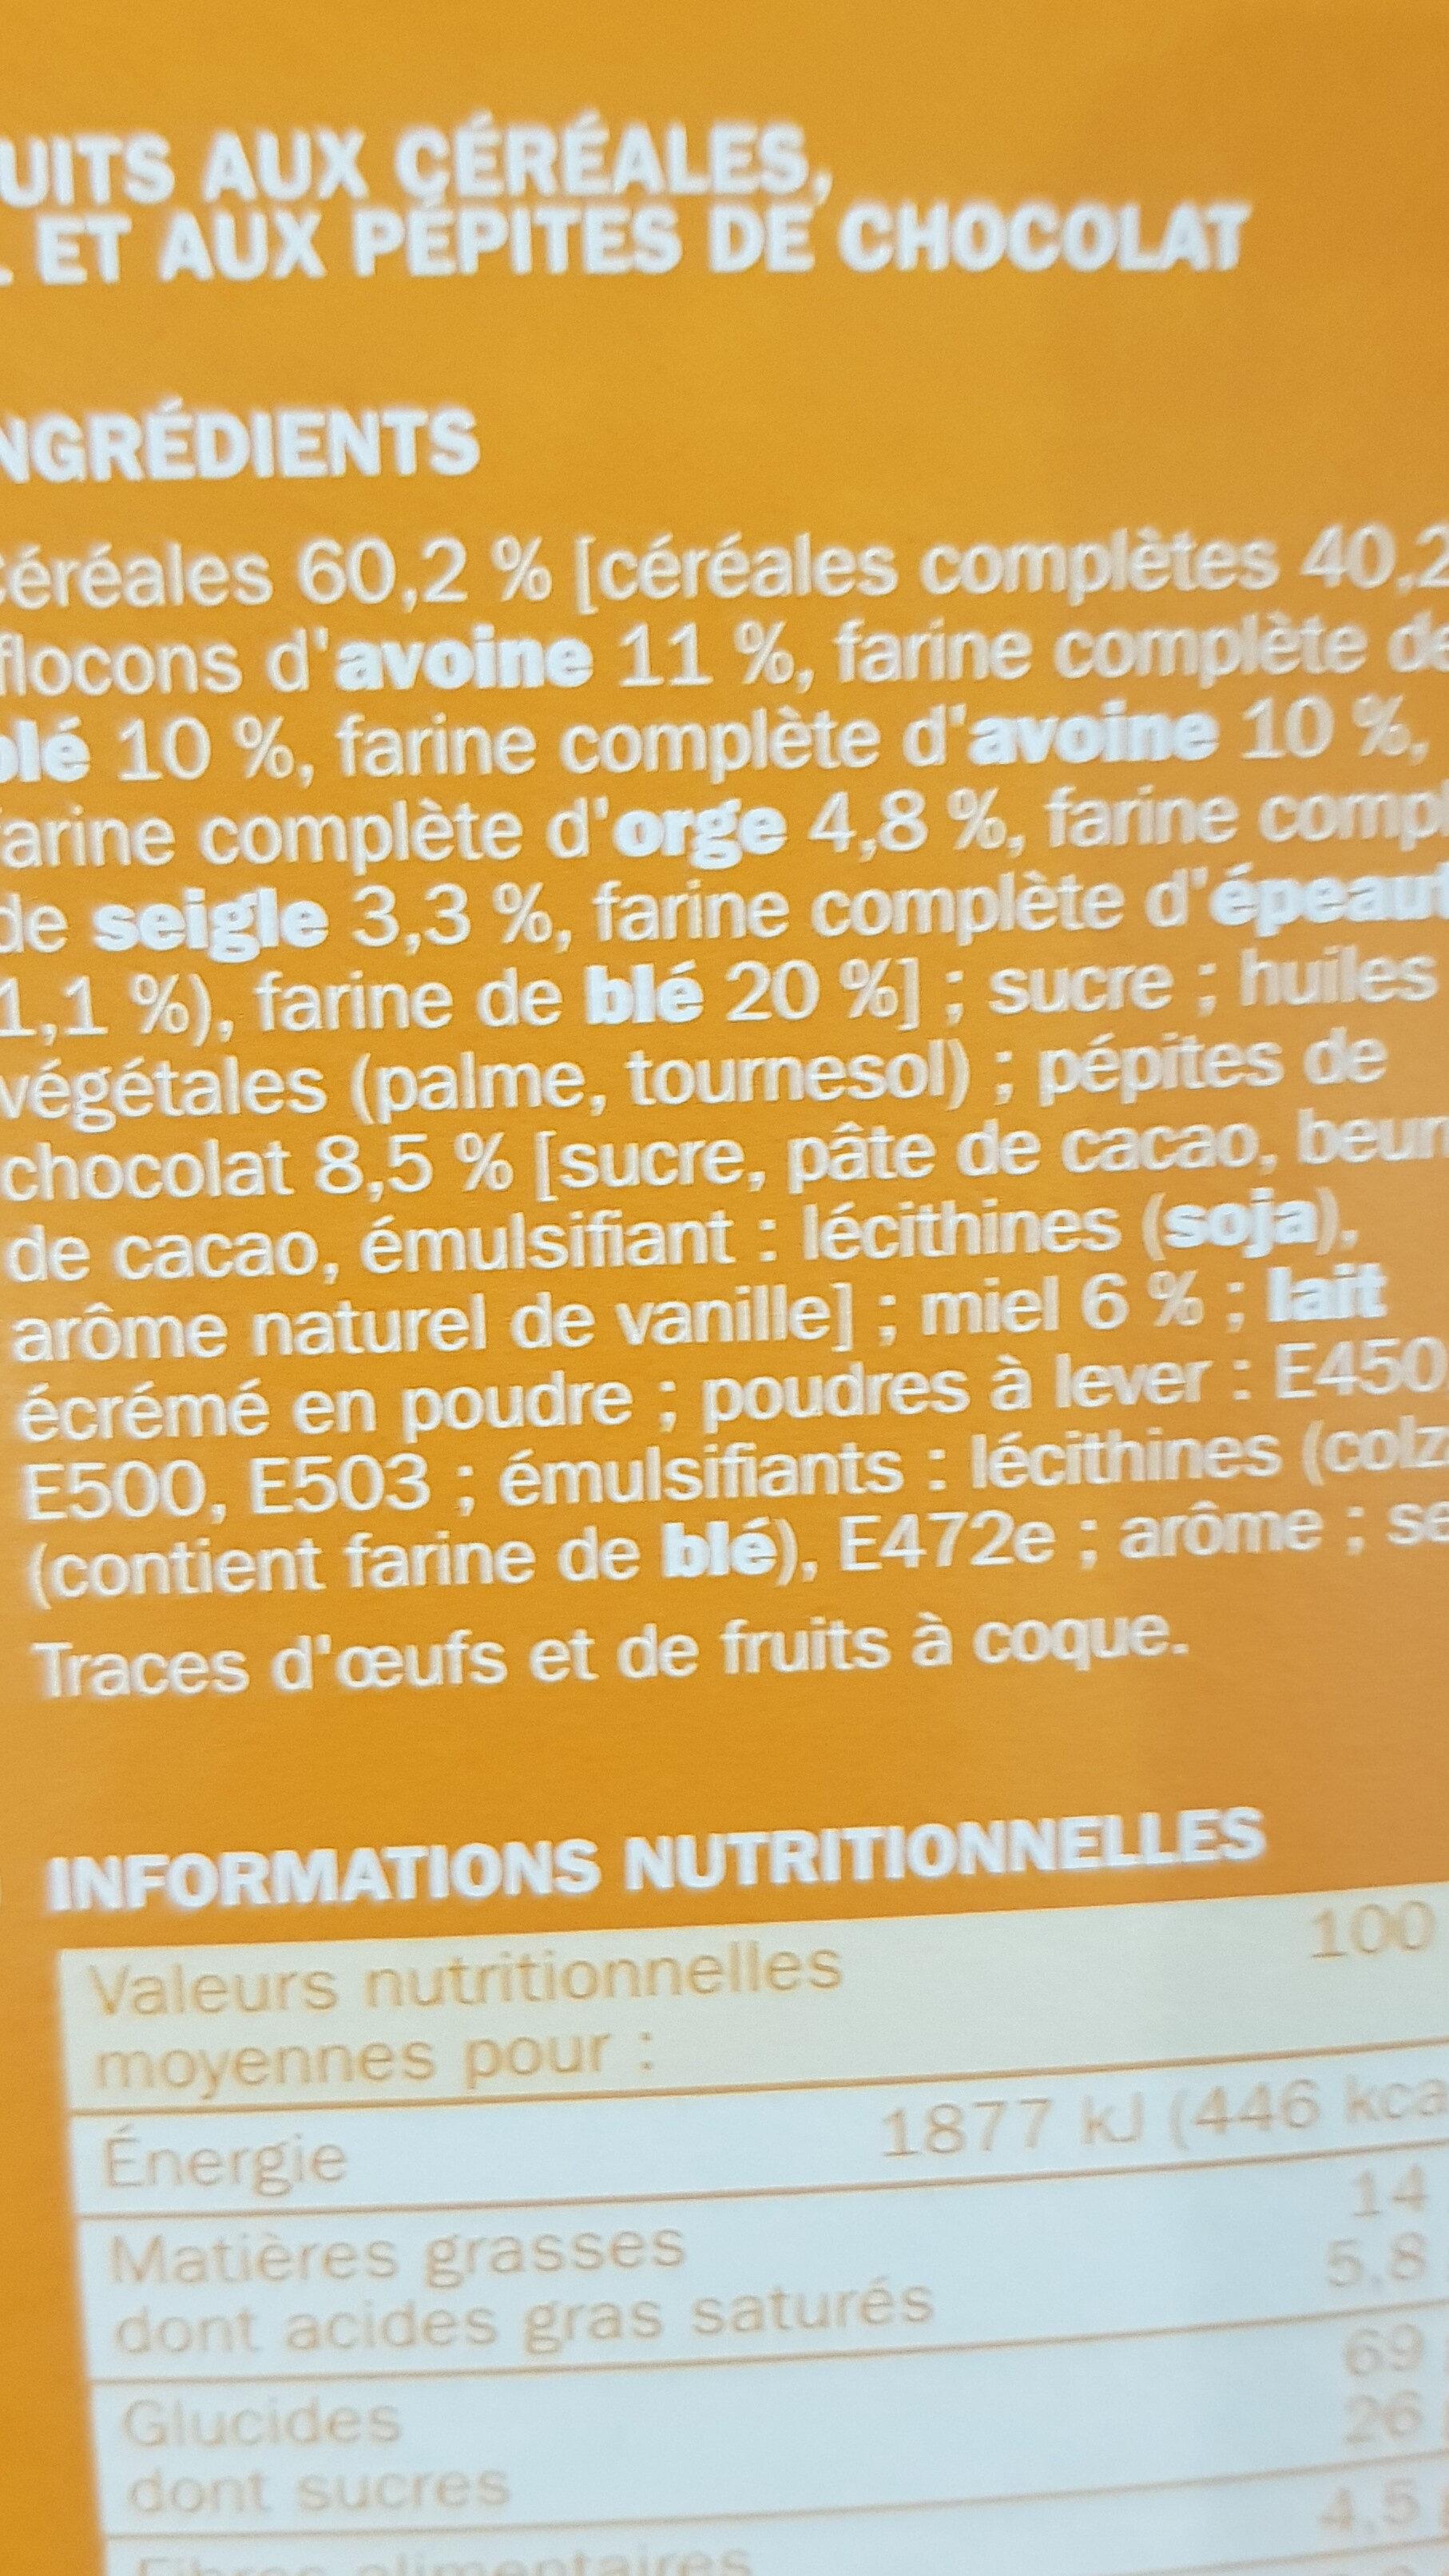 Biscuits petit déjeuner Déli-Matin miel et pépites de chocolat - Ingrediënten - fr